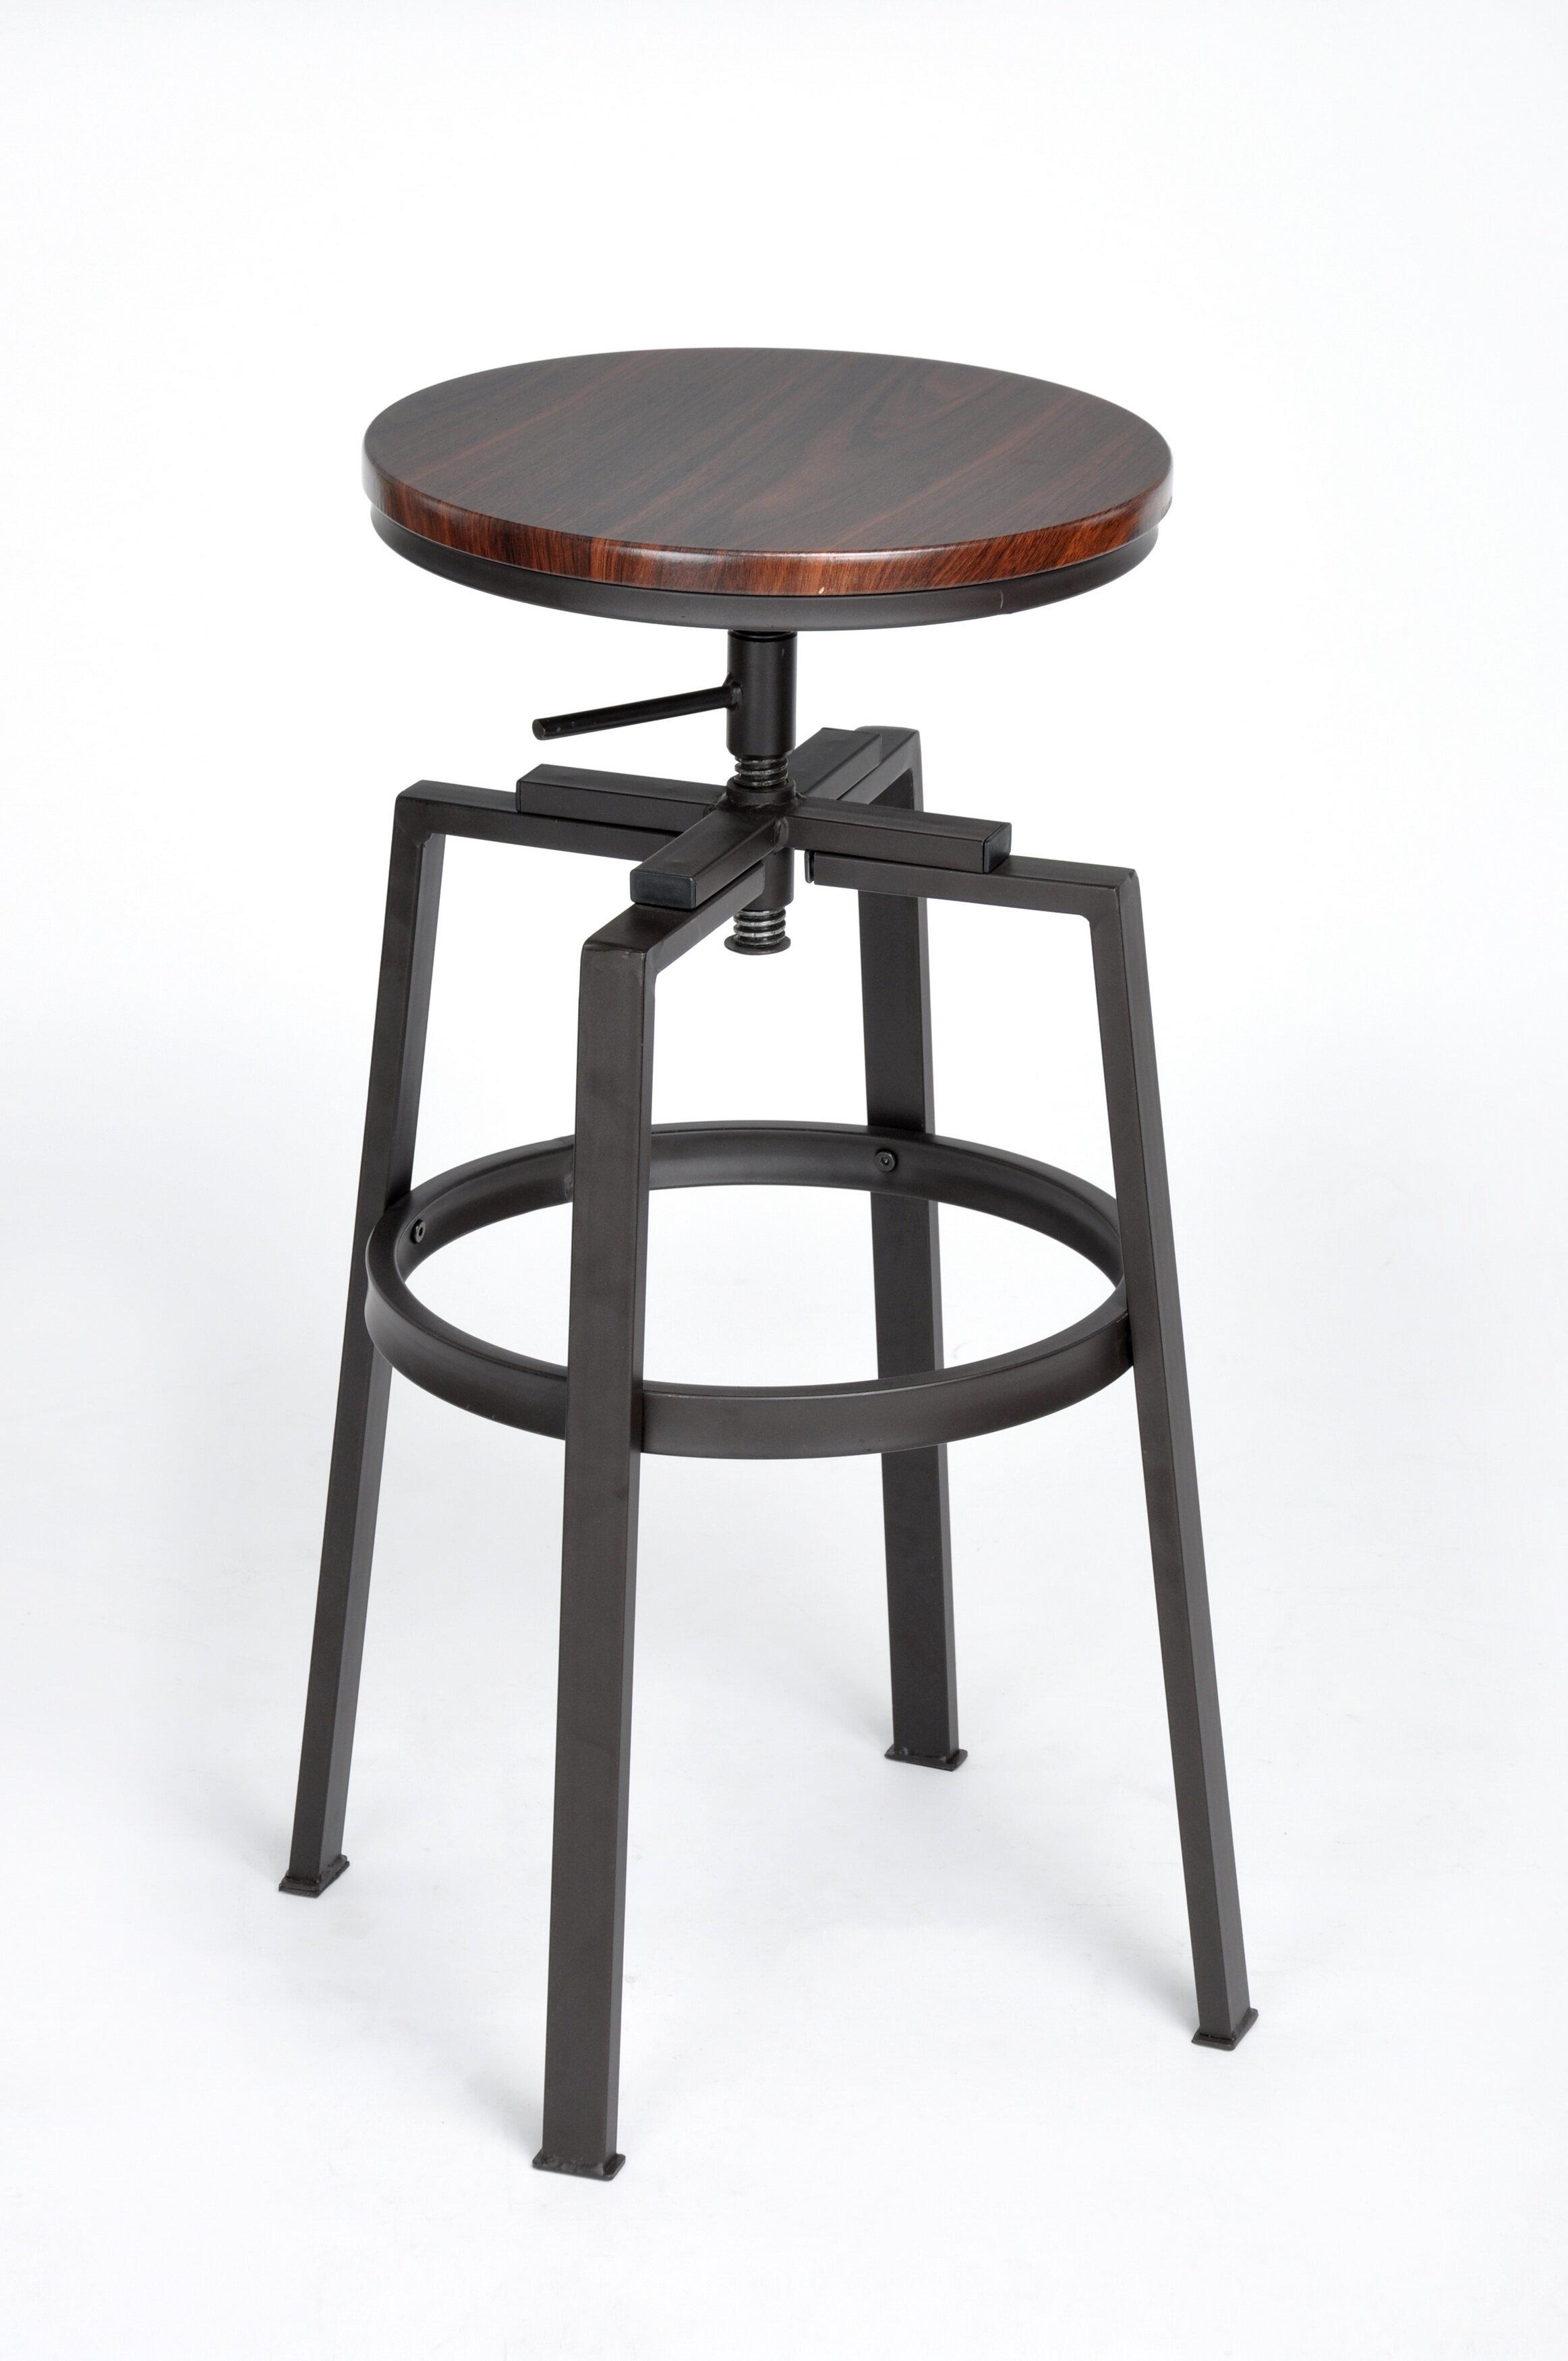 Sensational Gracie Oaks Garrett Adjustable Height Bar Stool Reviews Cjindustries Chair Design For Home Cjindustriesco